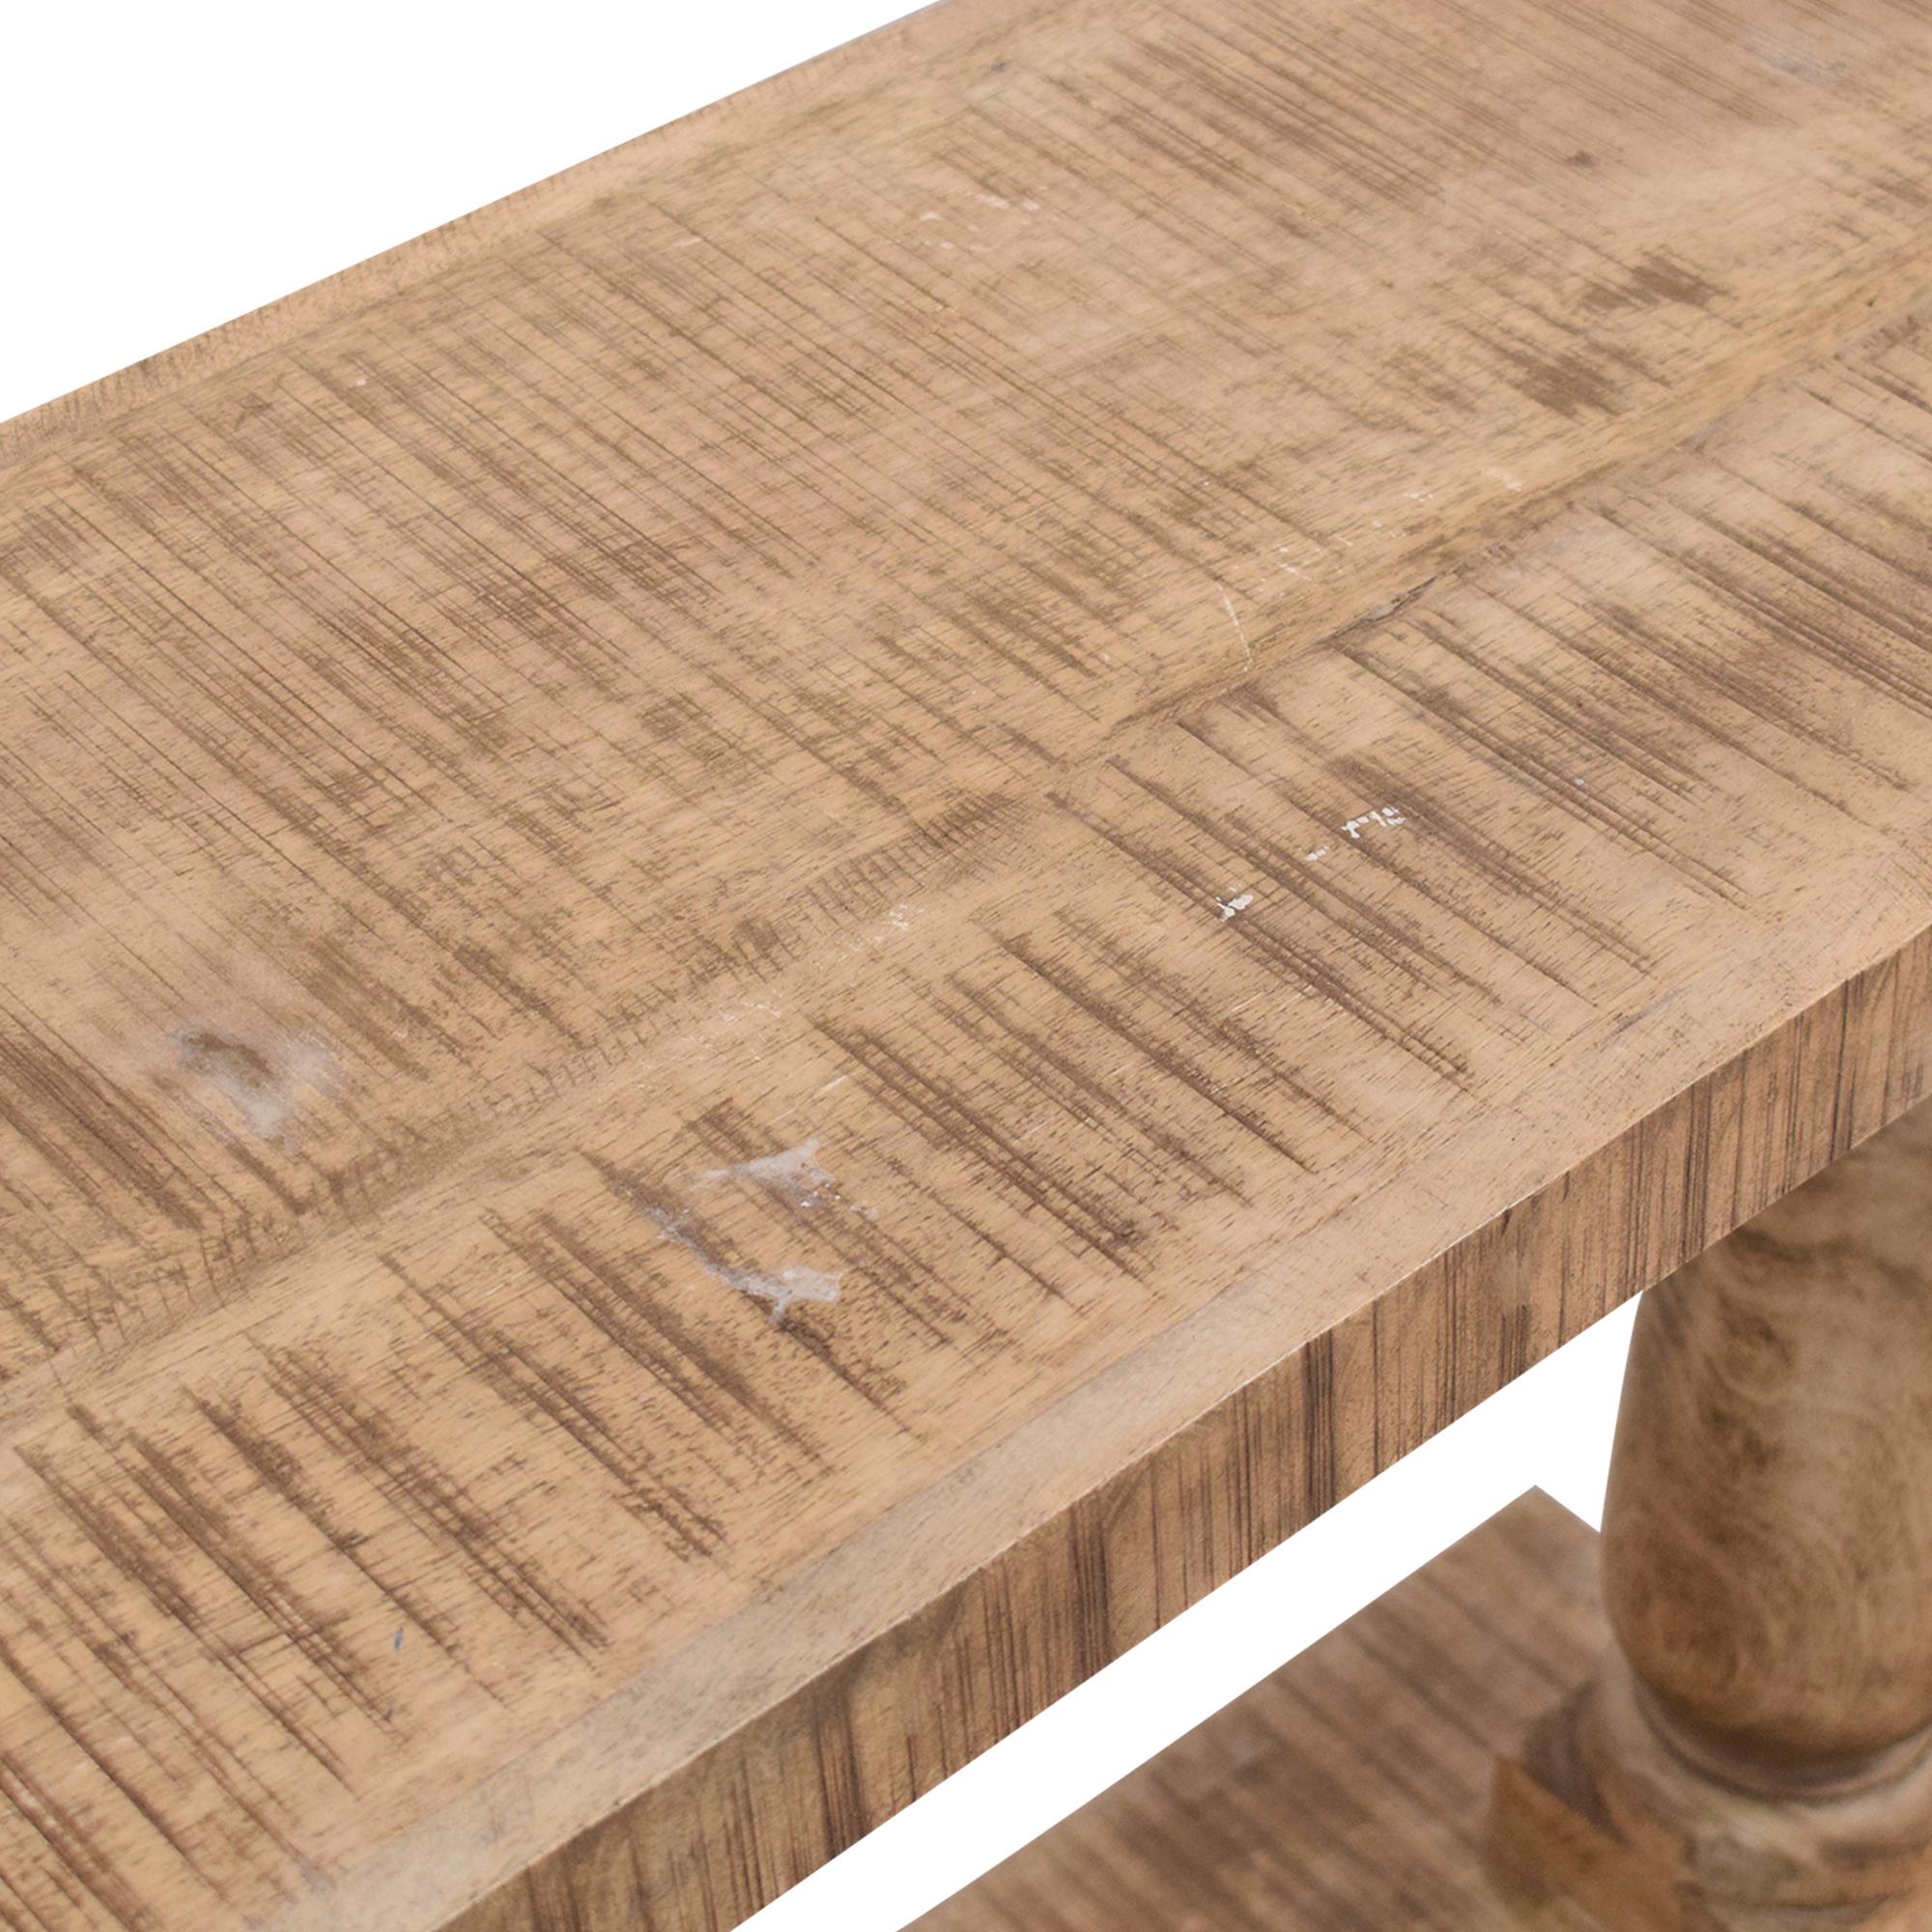 buy Macy's Rustic Turned Leg Console Table Macy's